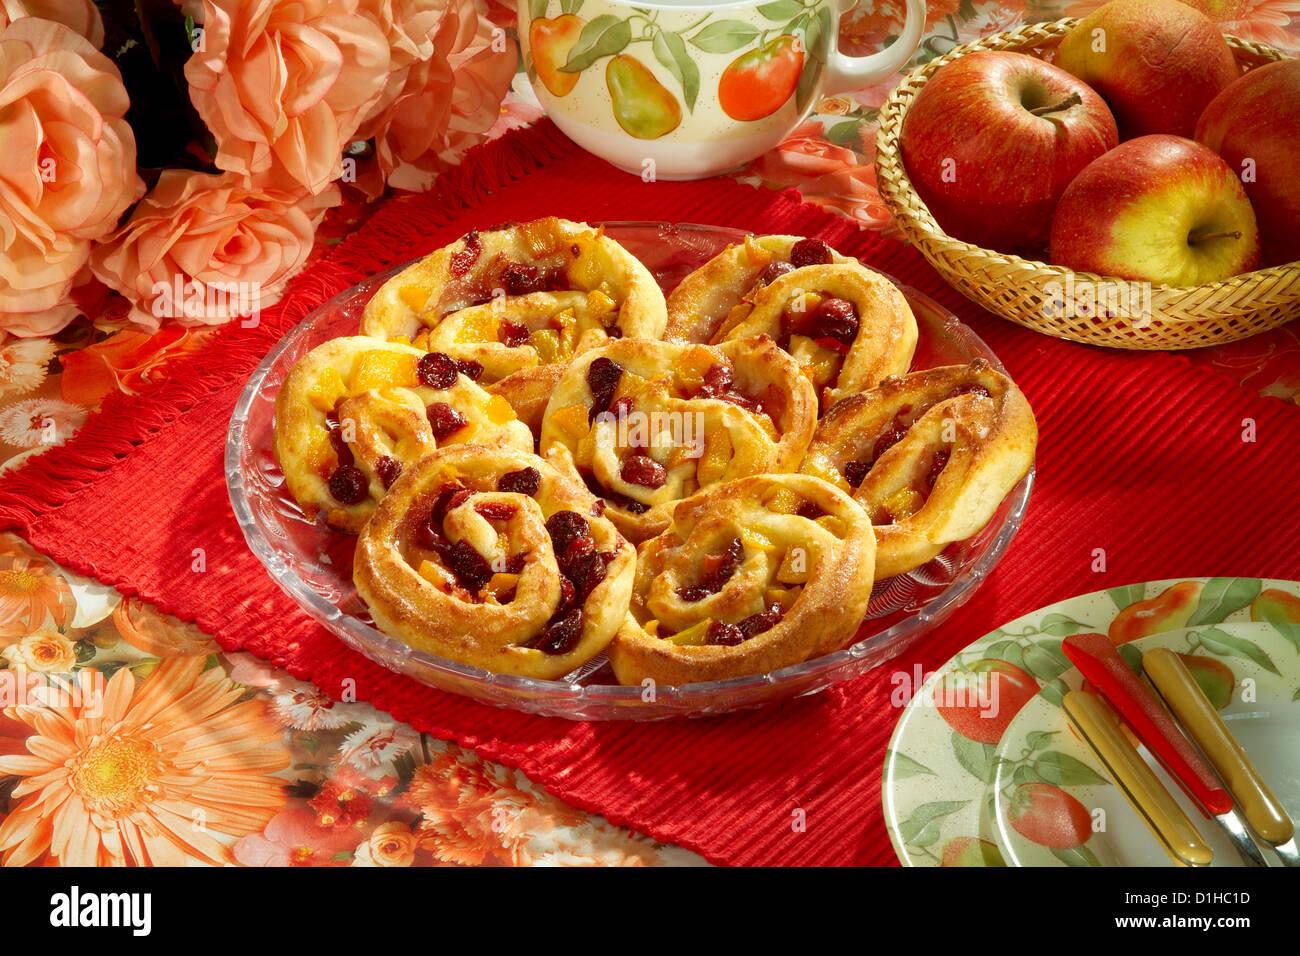 Cookies with cherries - Stock Image